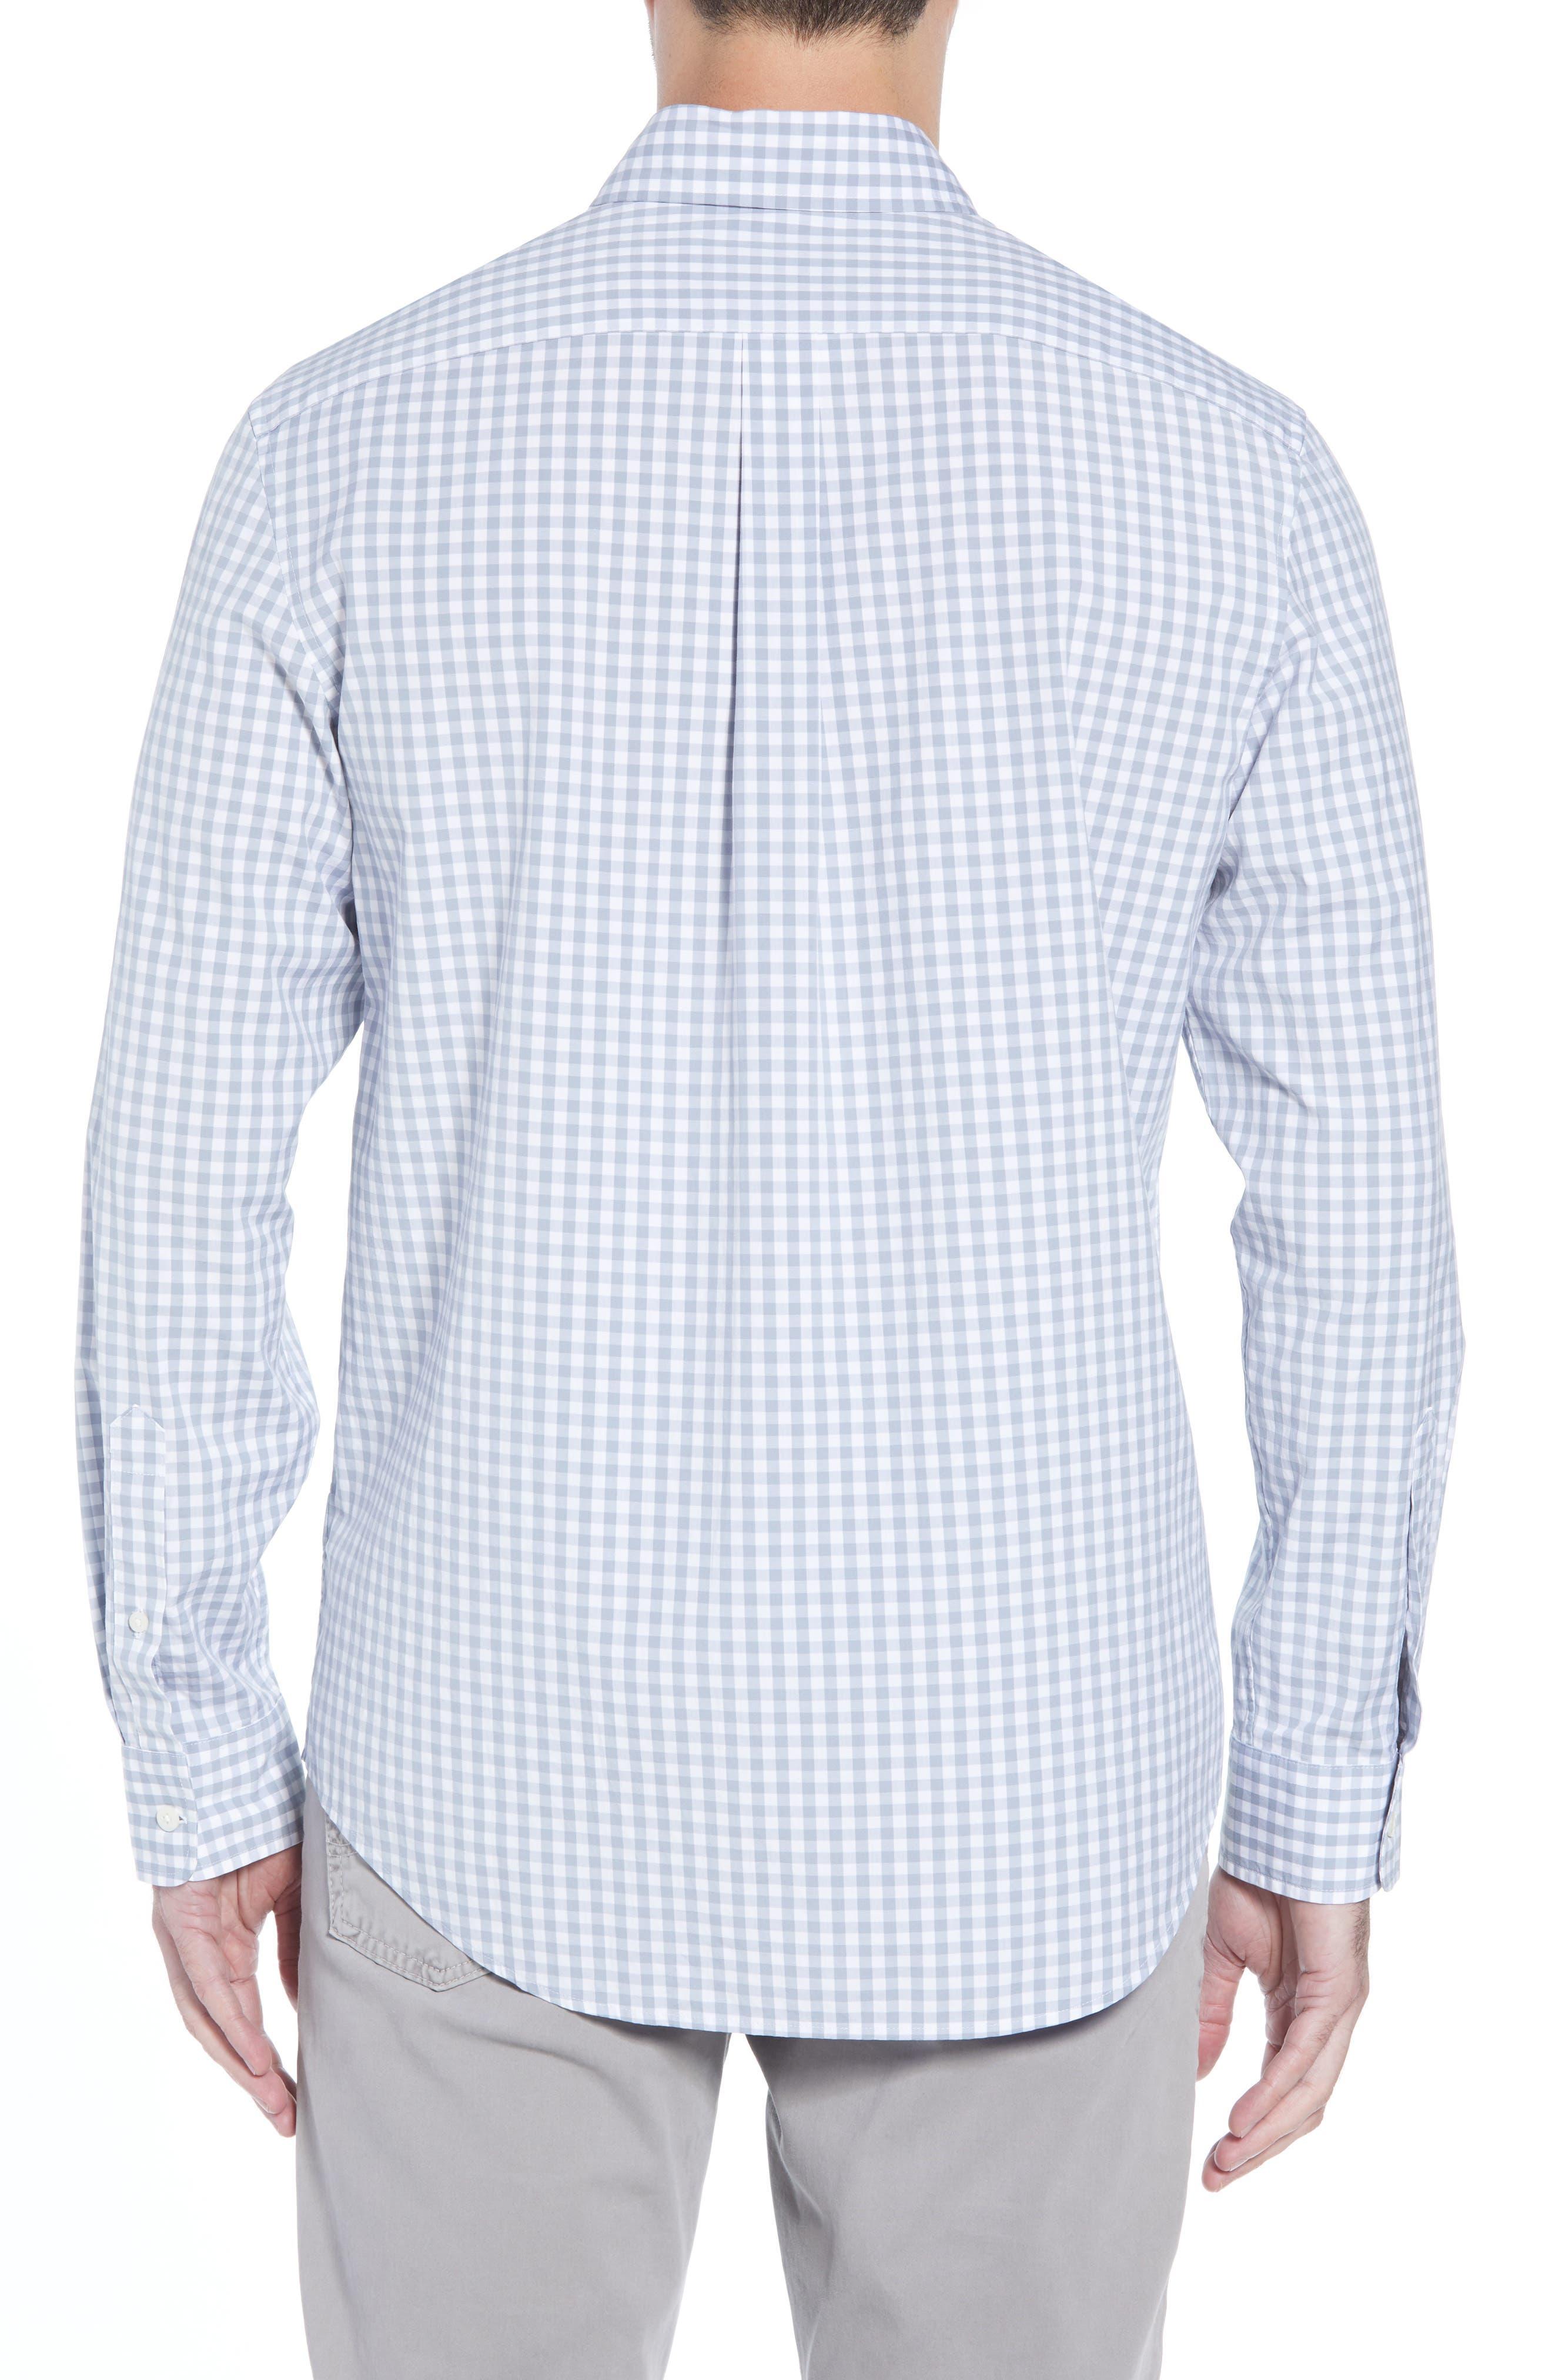 VINEYARD VINES, Carleton Classic Fit Gingham Buttondown Shirt, Alternate thumbnail 3, color, 023